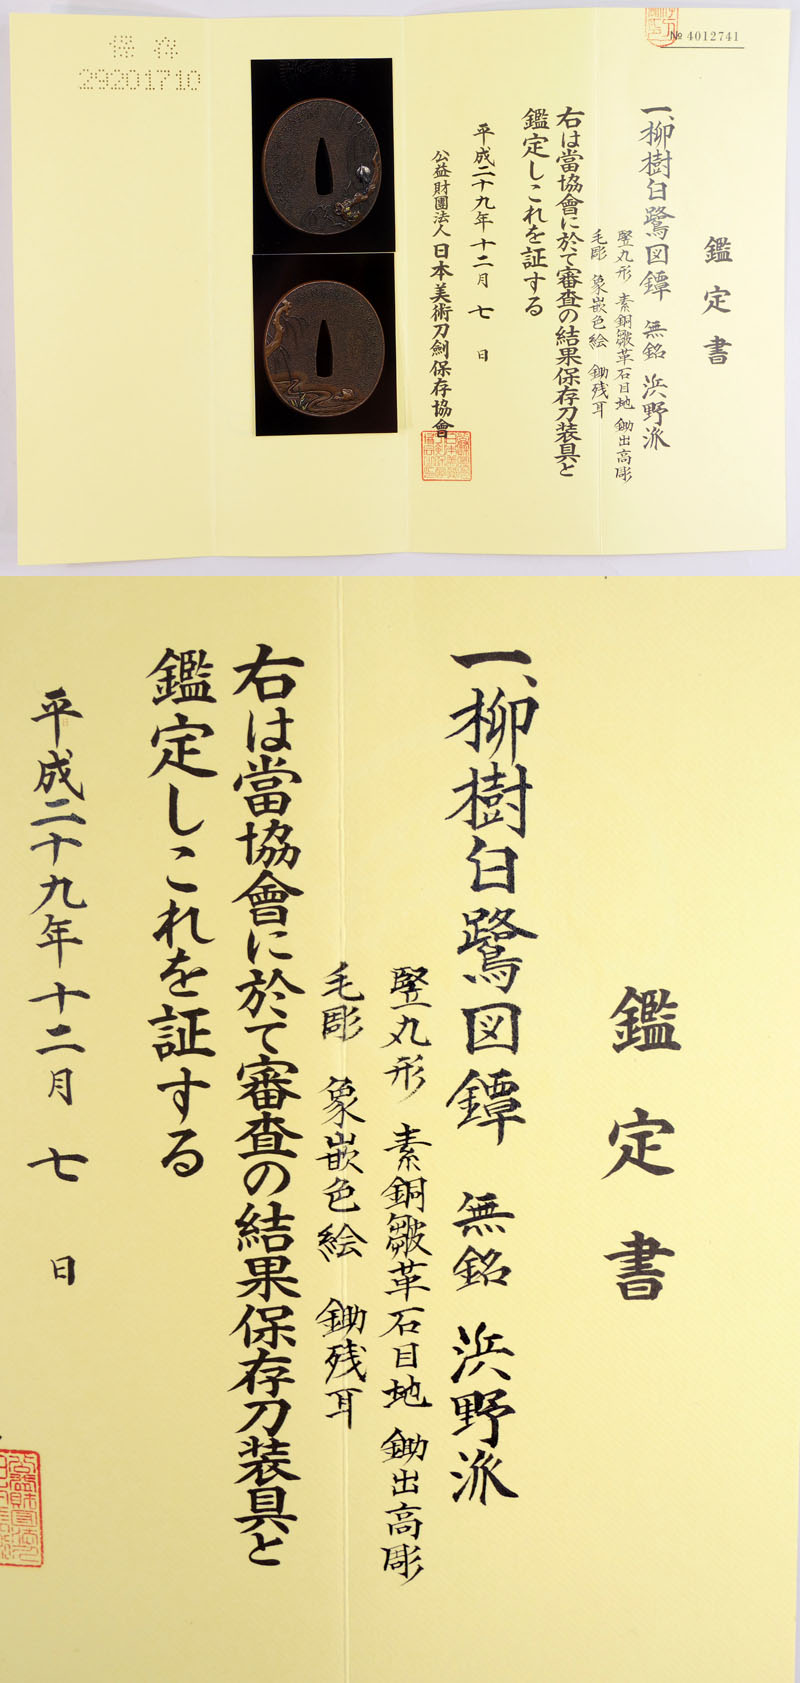 柳樹白鷺図鍔 無銘 浜野派 Picture of Certificate